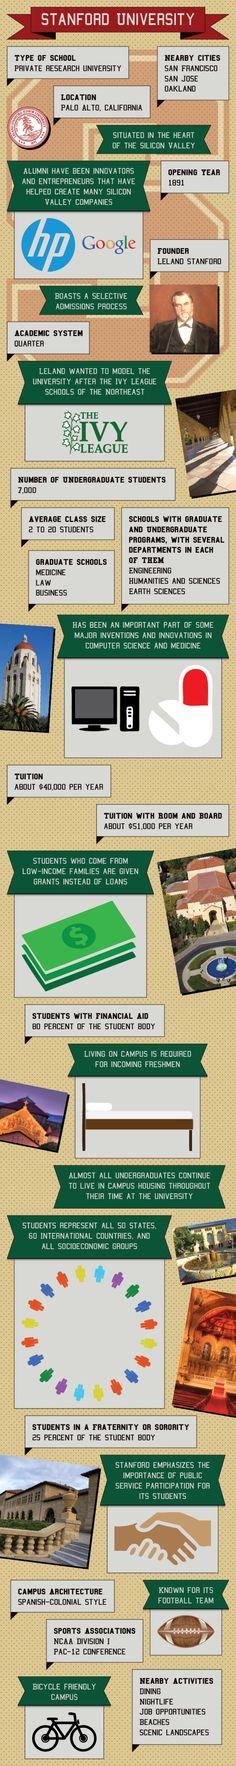 Stanford University Infographic